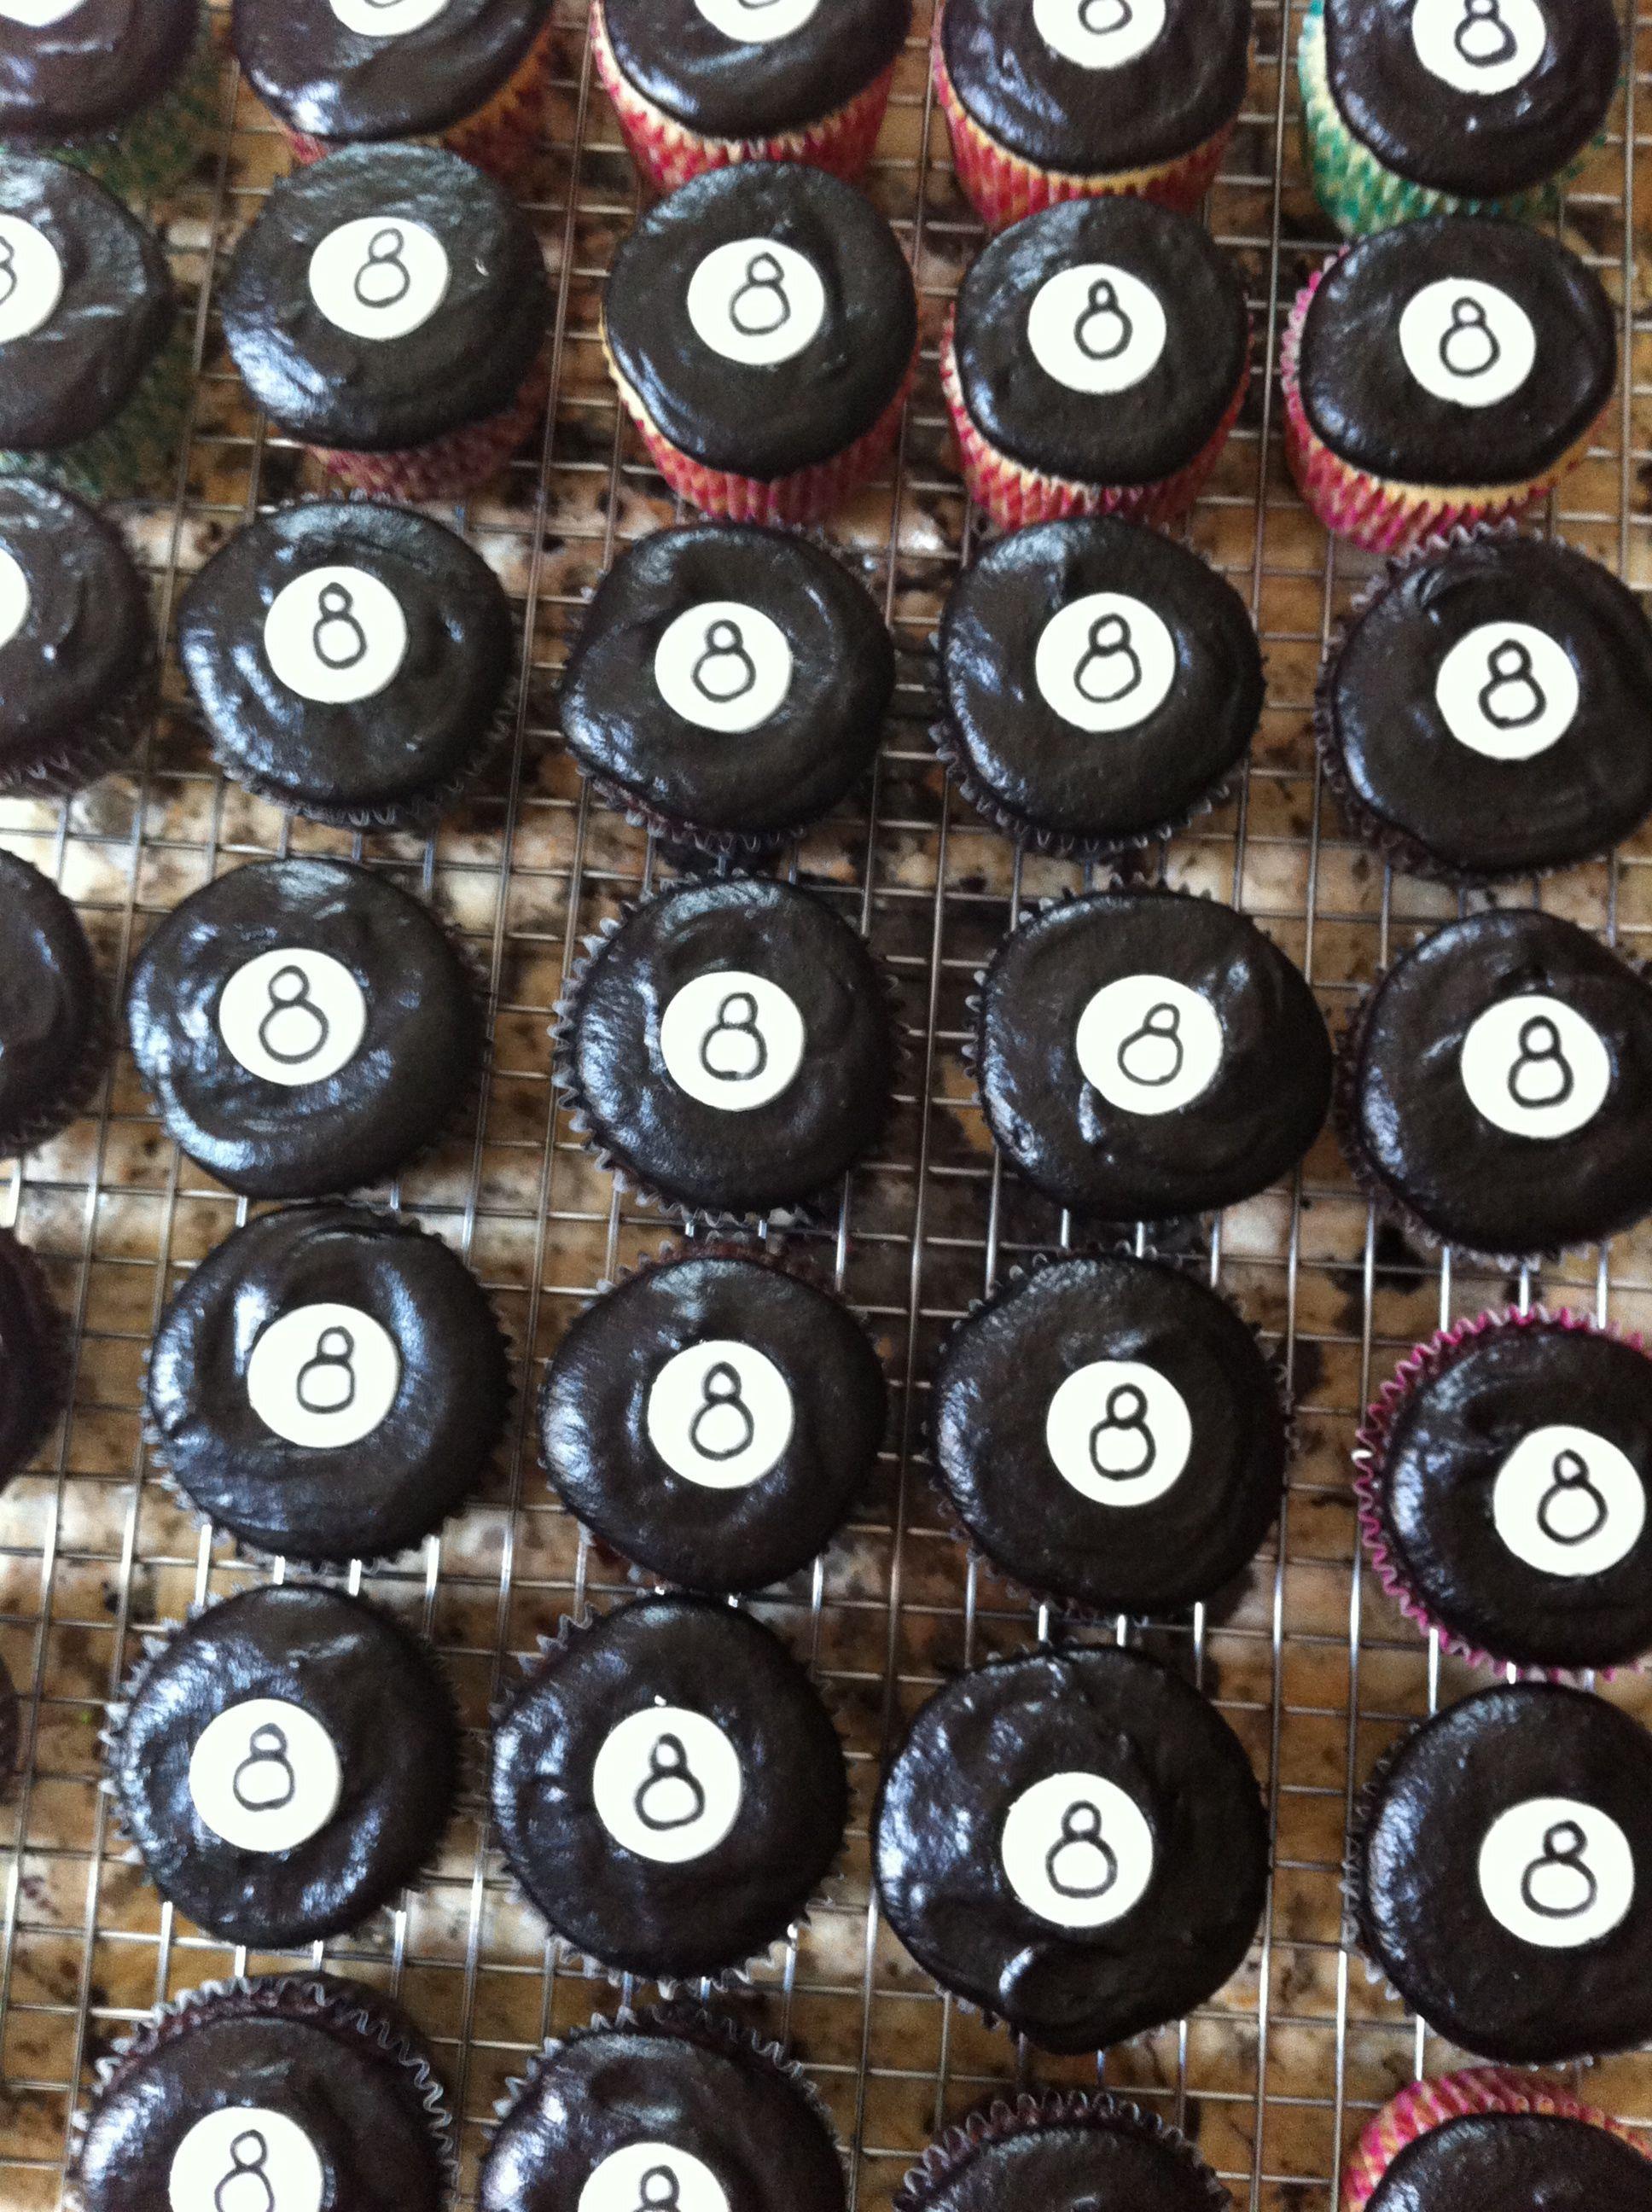 8 cupcakes